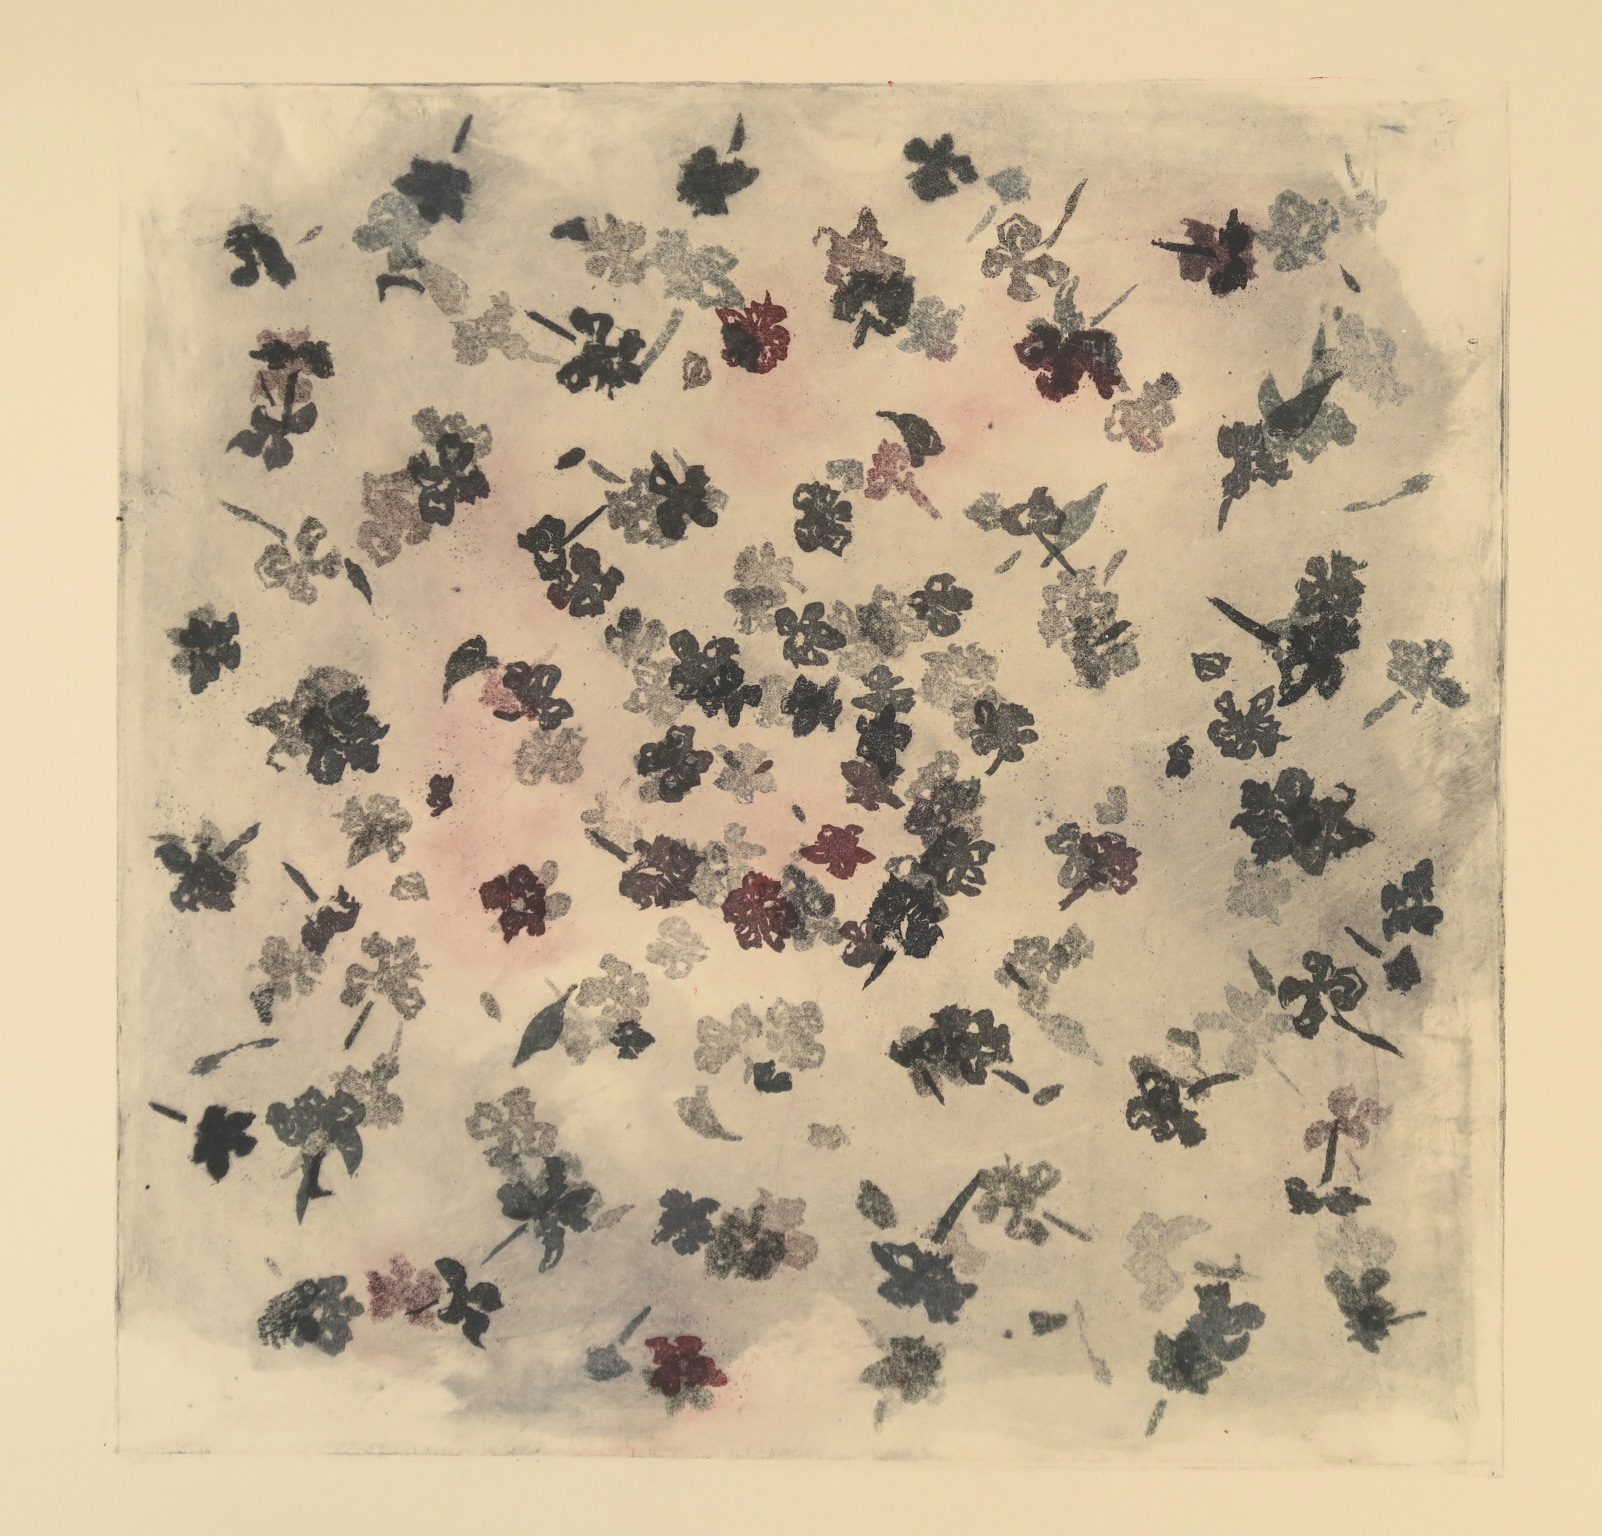 Blind Woman's Garden IV_Gina McDonald_etching.JPG